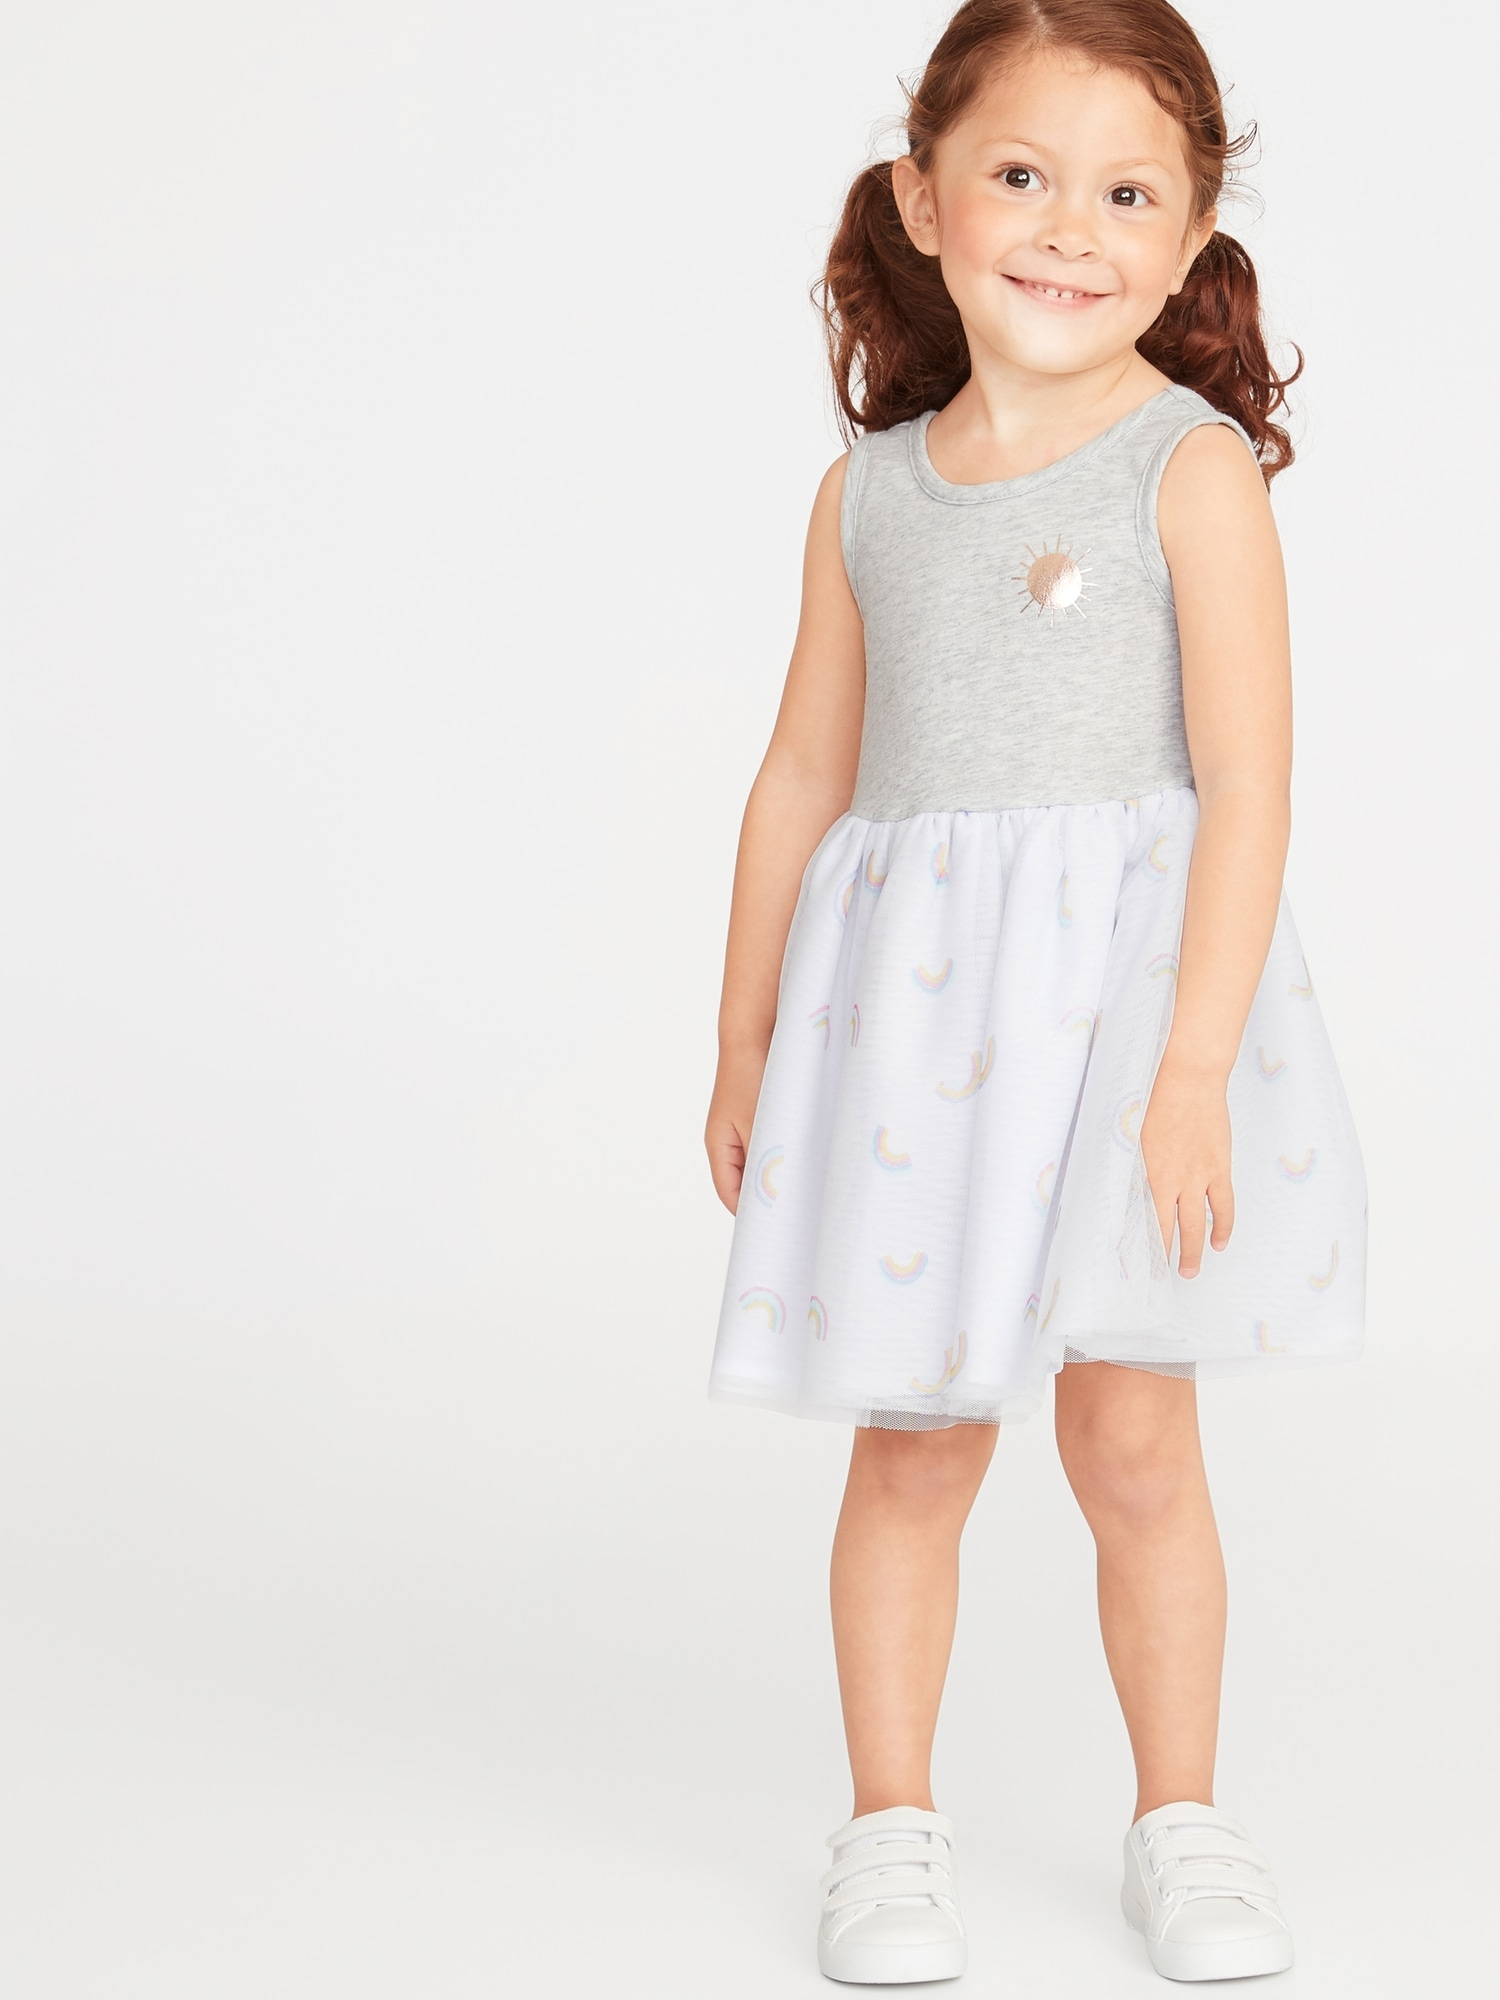 a88d838910 Printed Tutu Tank Dress for Toddler Girls